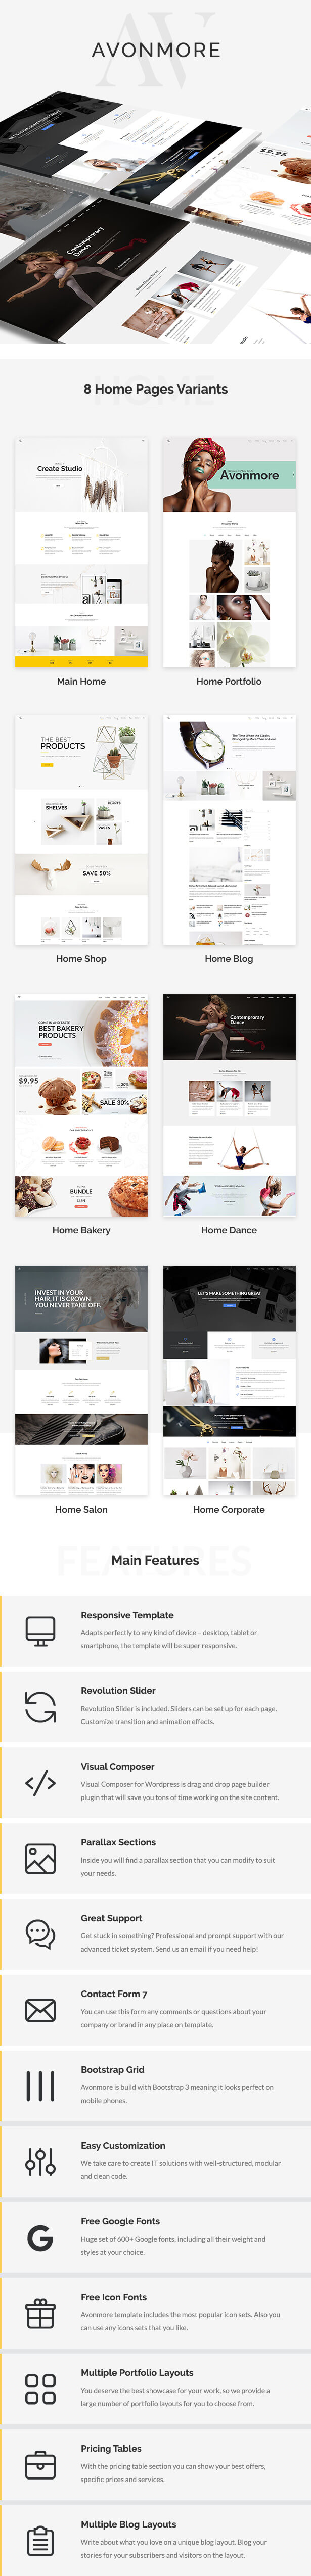 Kreatives Mehrzweck-WordPress-Theme - Avonmore - 2